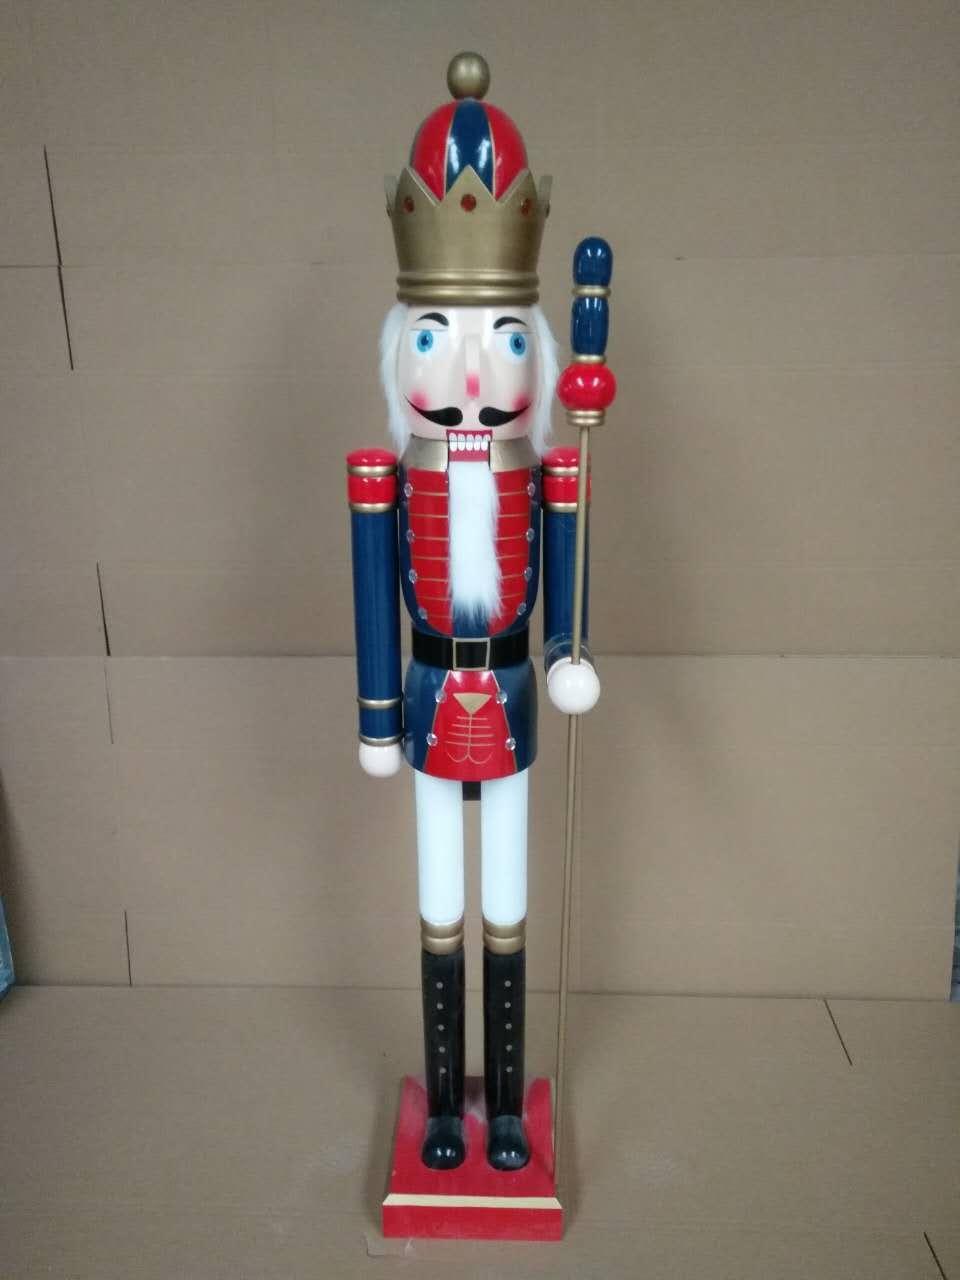 2021 120cm 150cm wooden 6 foot nutcracker for sale 7